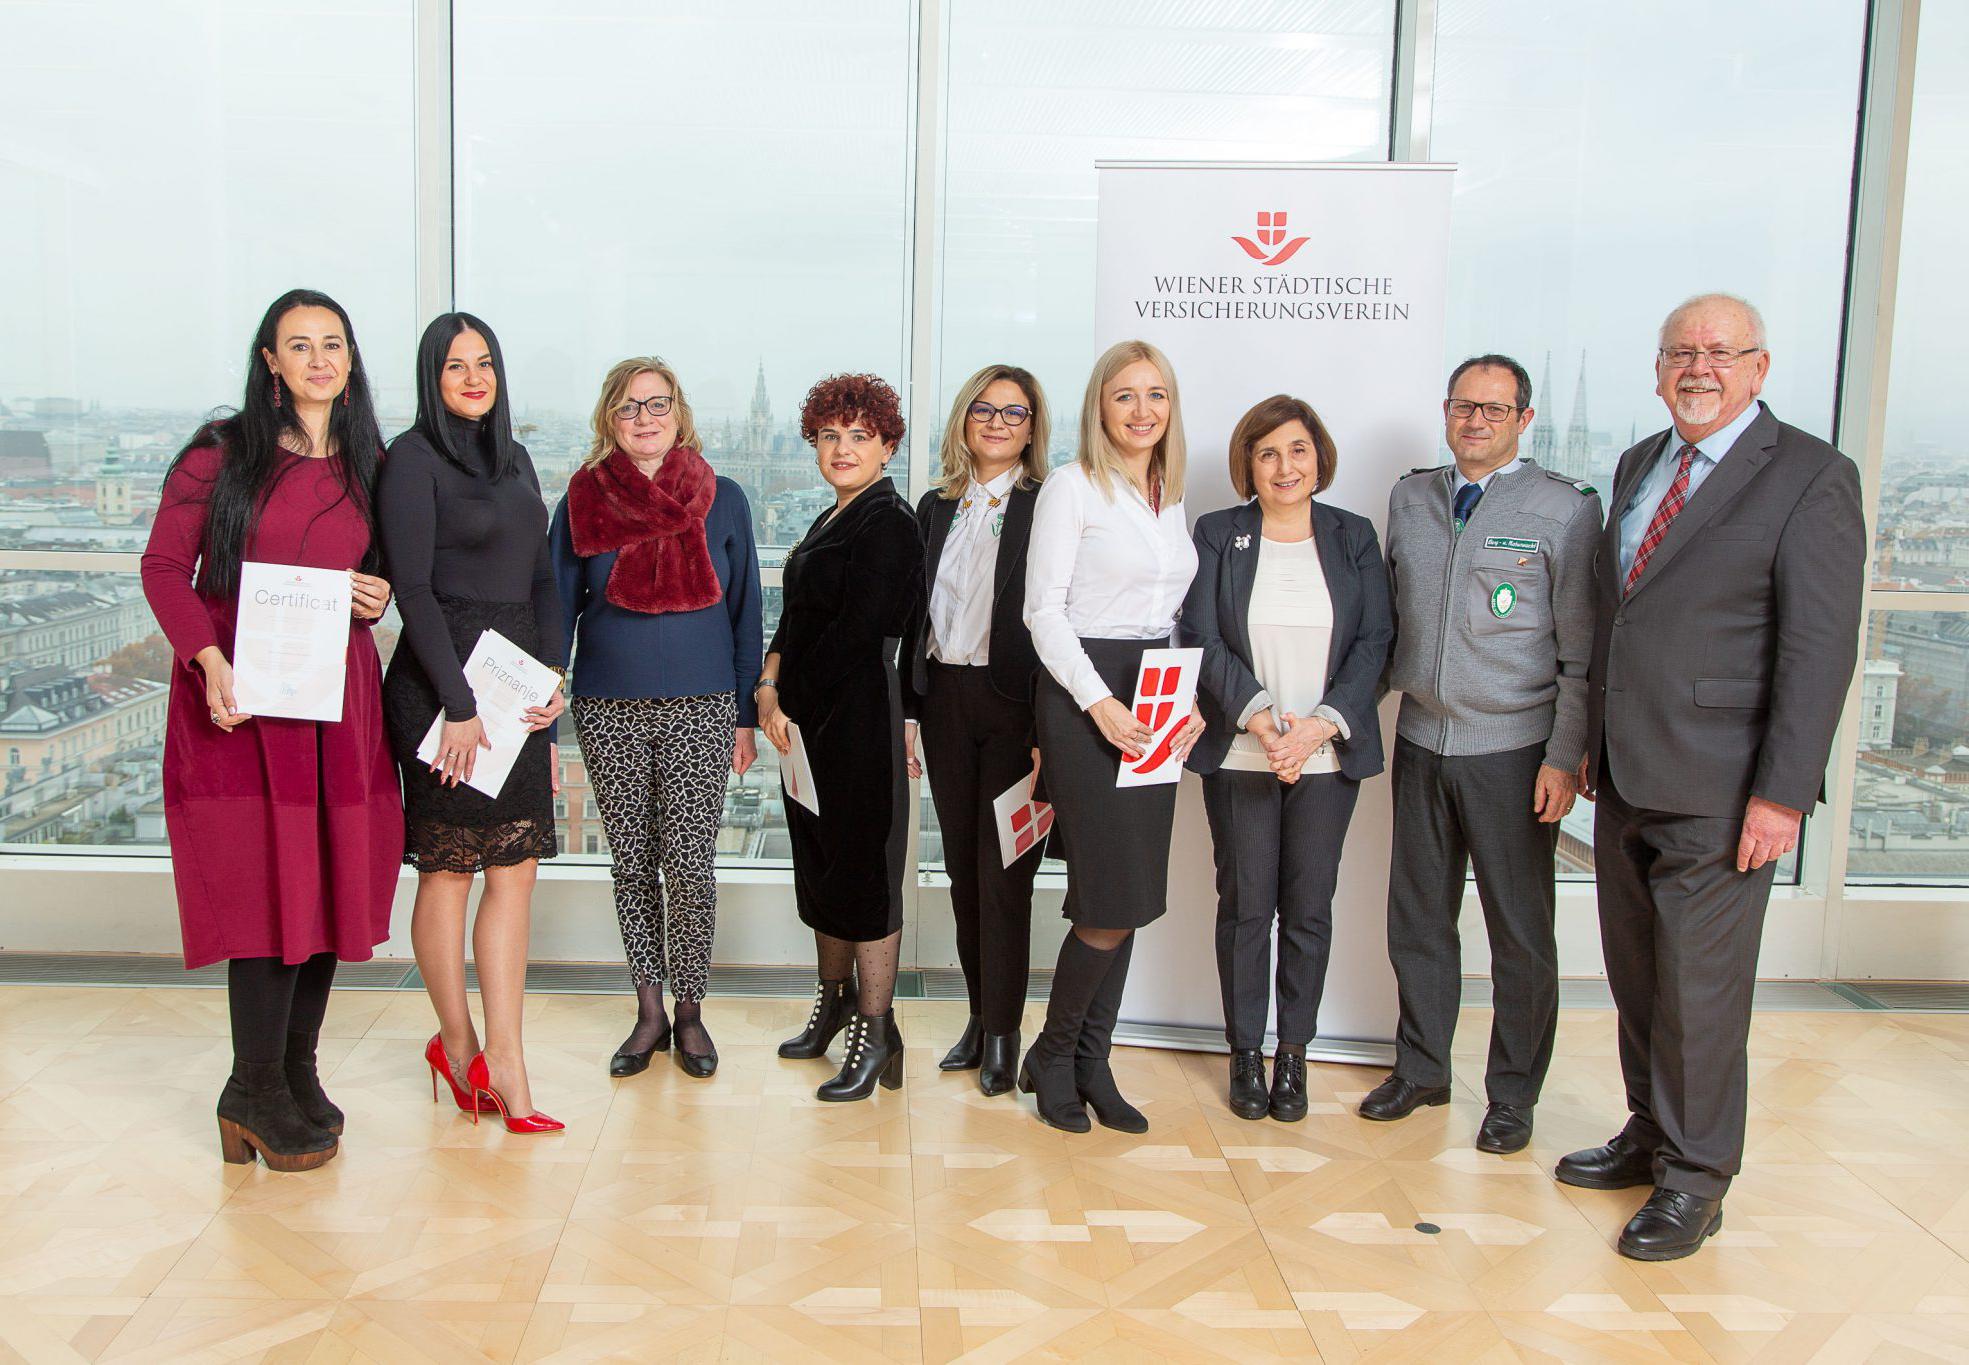 On the picture (from left to right): Simona Otilia Tatu (Romania), Maja Jurinec (Croatia), Barbara Grötschnig (head of VIG Group Sponsoring), Nata Mestumrishvili & Shorena Miminoshvili from Georgia, Karolina Karpova (Lithuania), Ina Berulava (Georgia), Robert Kallinger (Austria) & Hans Raumauf (member of the Wiener Städtische Versicherungsverein Management Board) © Richard Tanzer